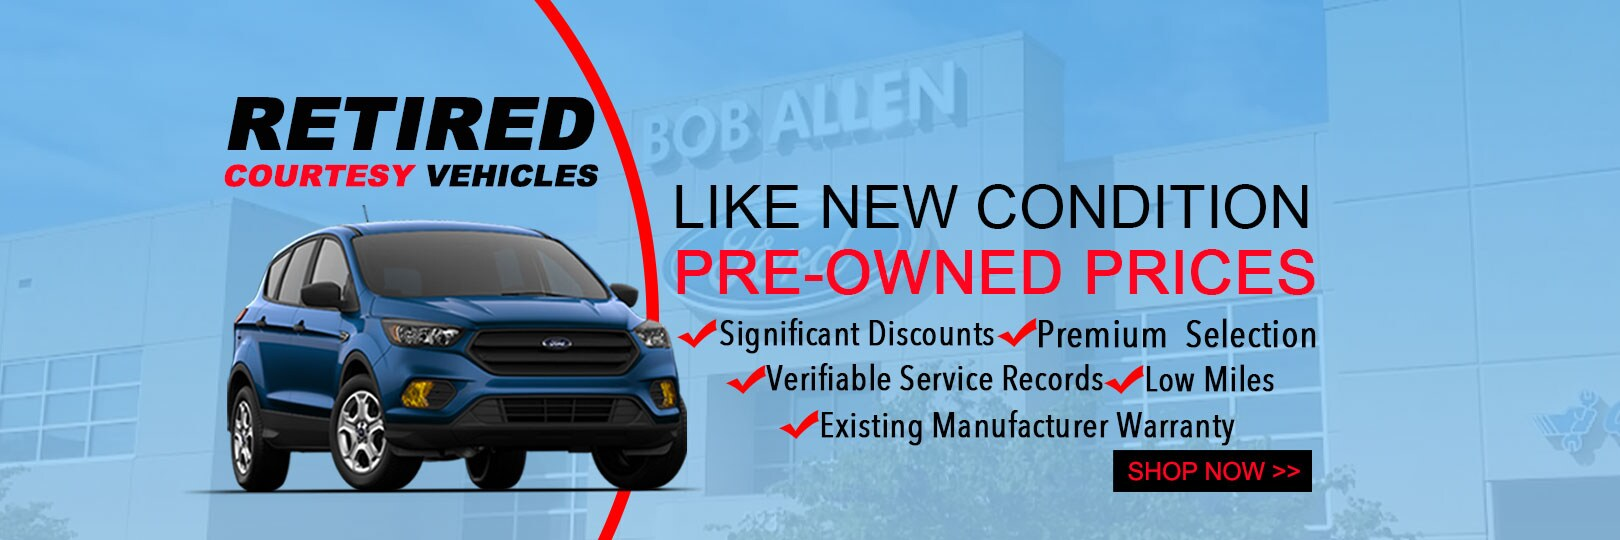 Kansas City Ford Dealers >> New Ford Used Car Dealership In Overland Park Ks Bob